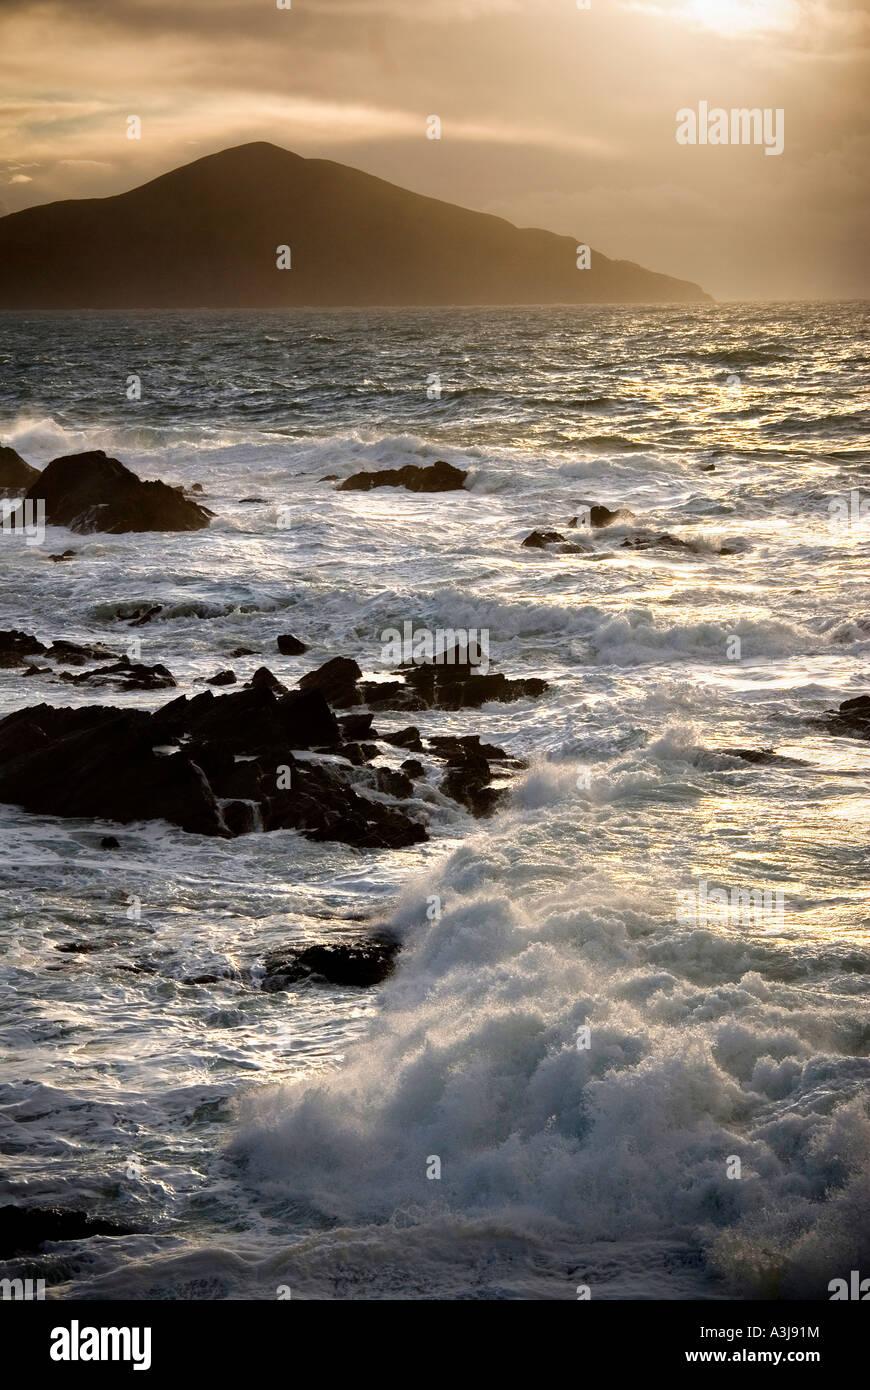 Atlantic Drive, Achill Island, Co. Mayo, Ireland - Stock Image